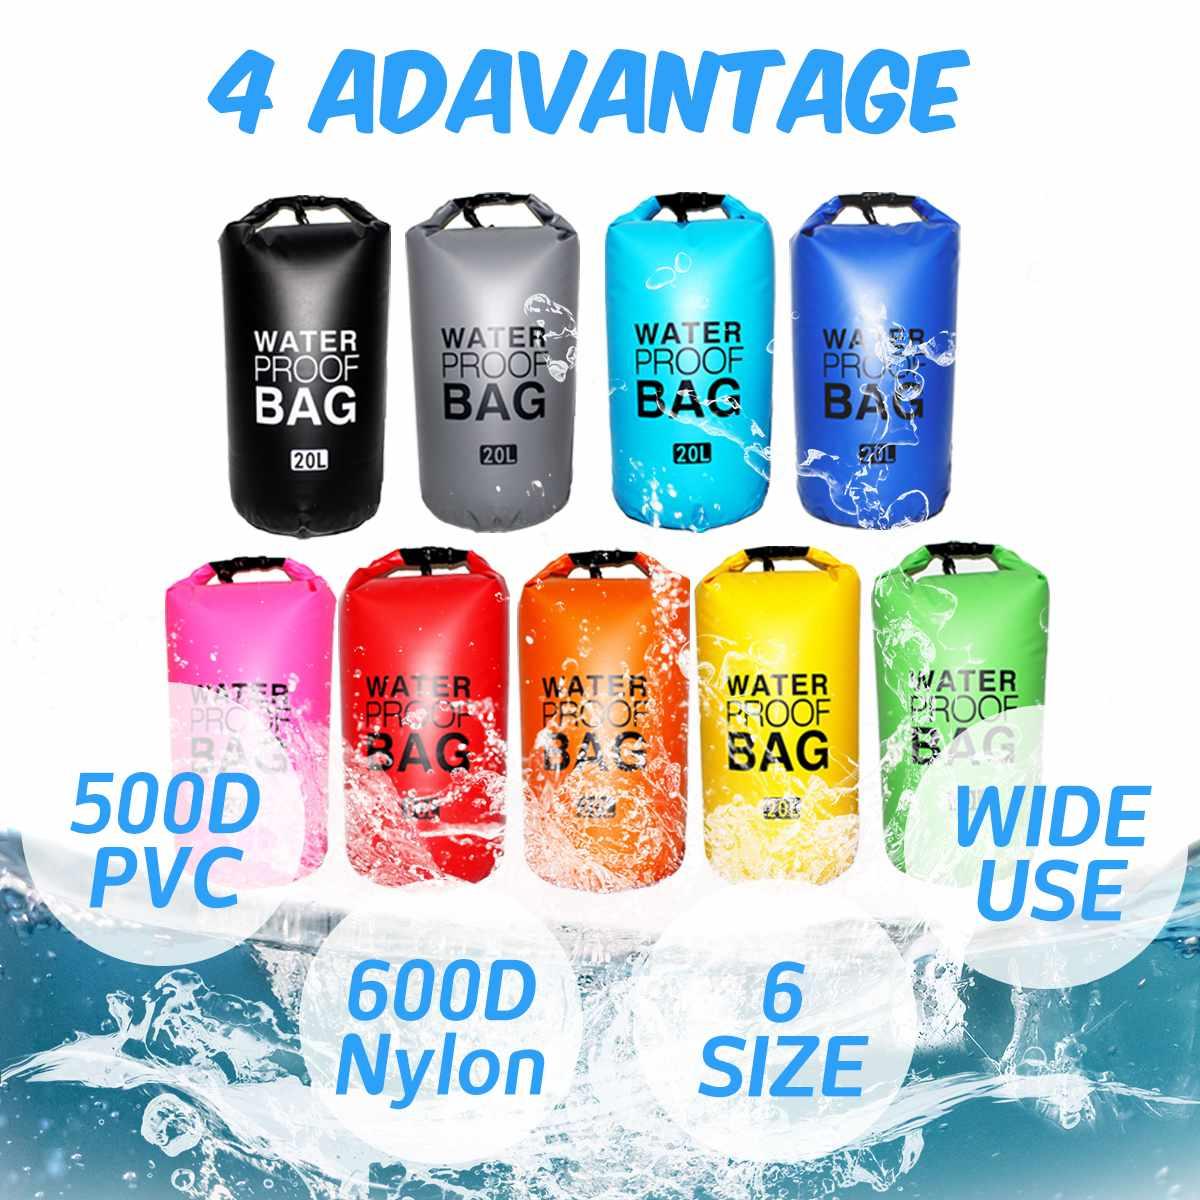 Gotecool PVC Shoulder Ultralight Swimming Bag Dry 9 Colors Outdoor Nylon Kayaking Storage Drifting Waterproof Rafting Bag 2L